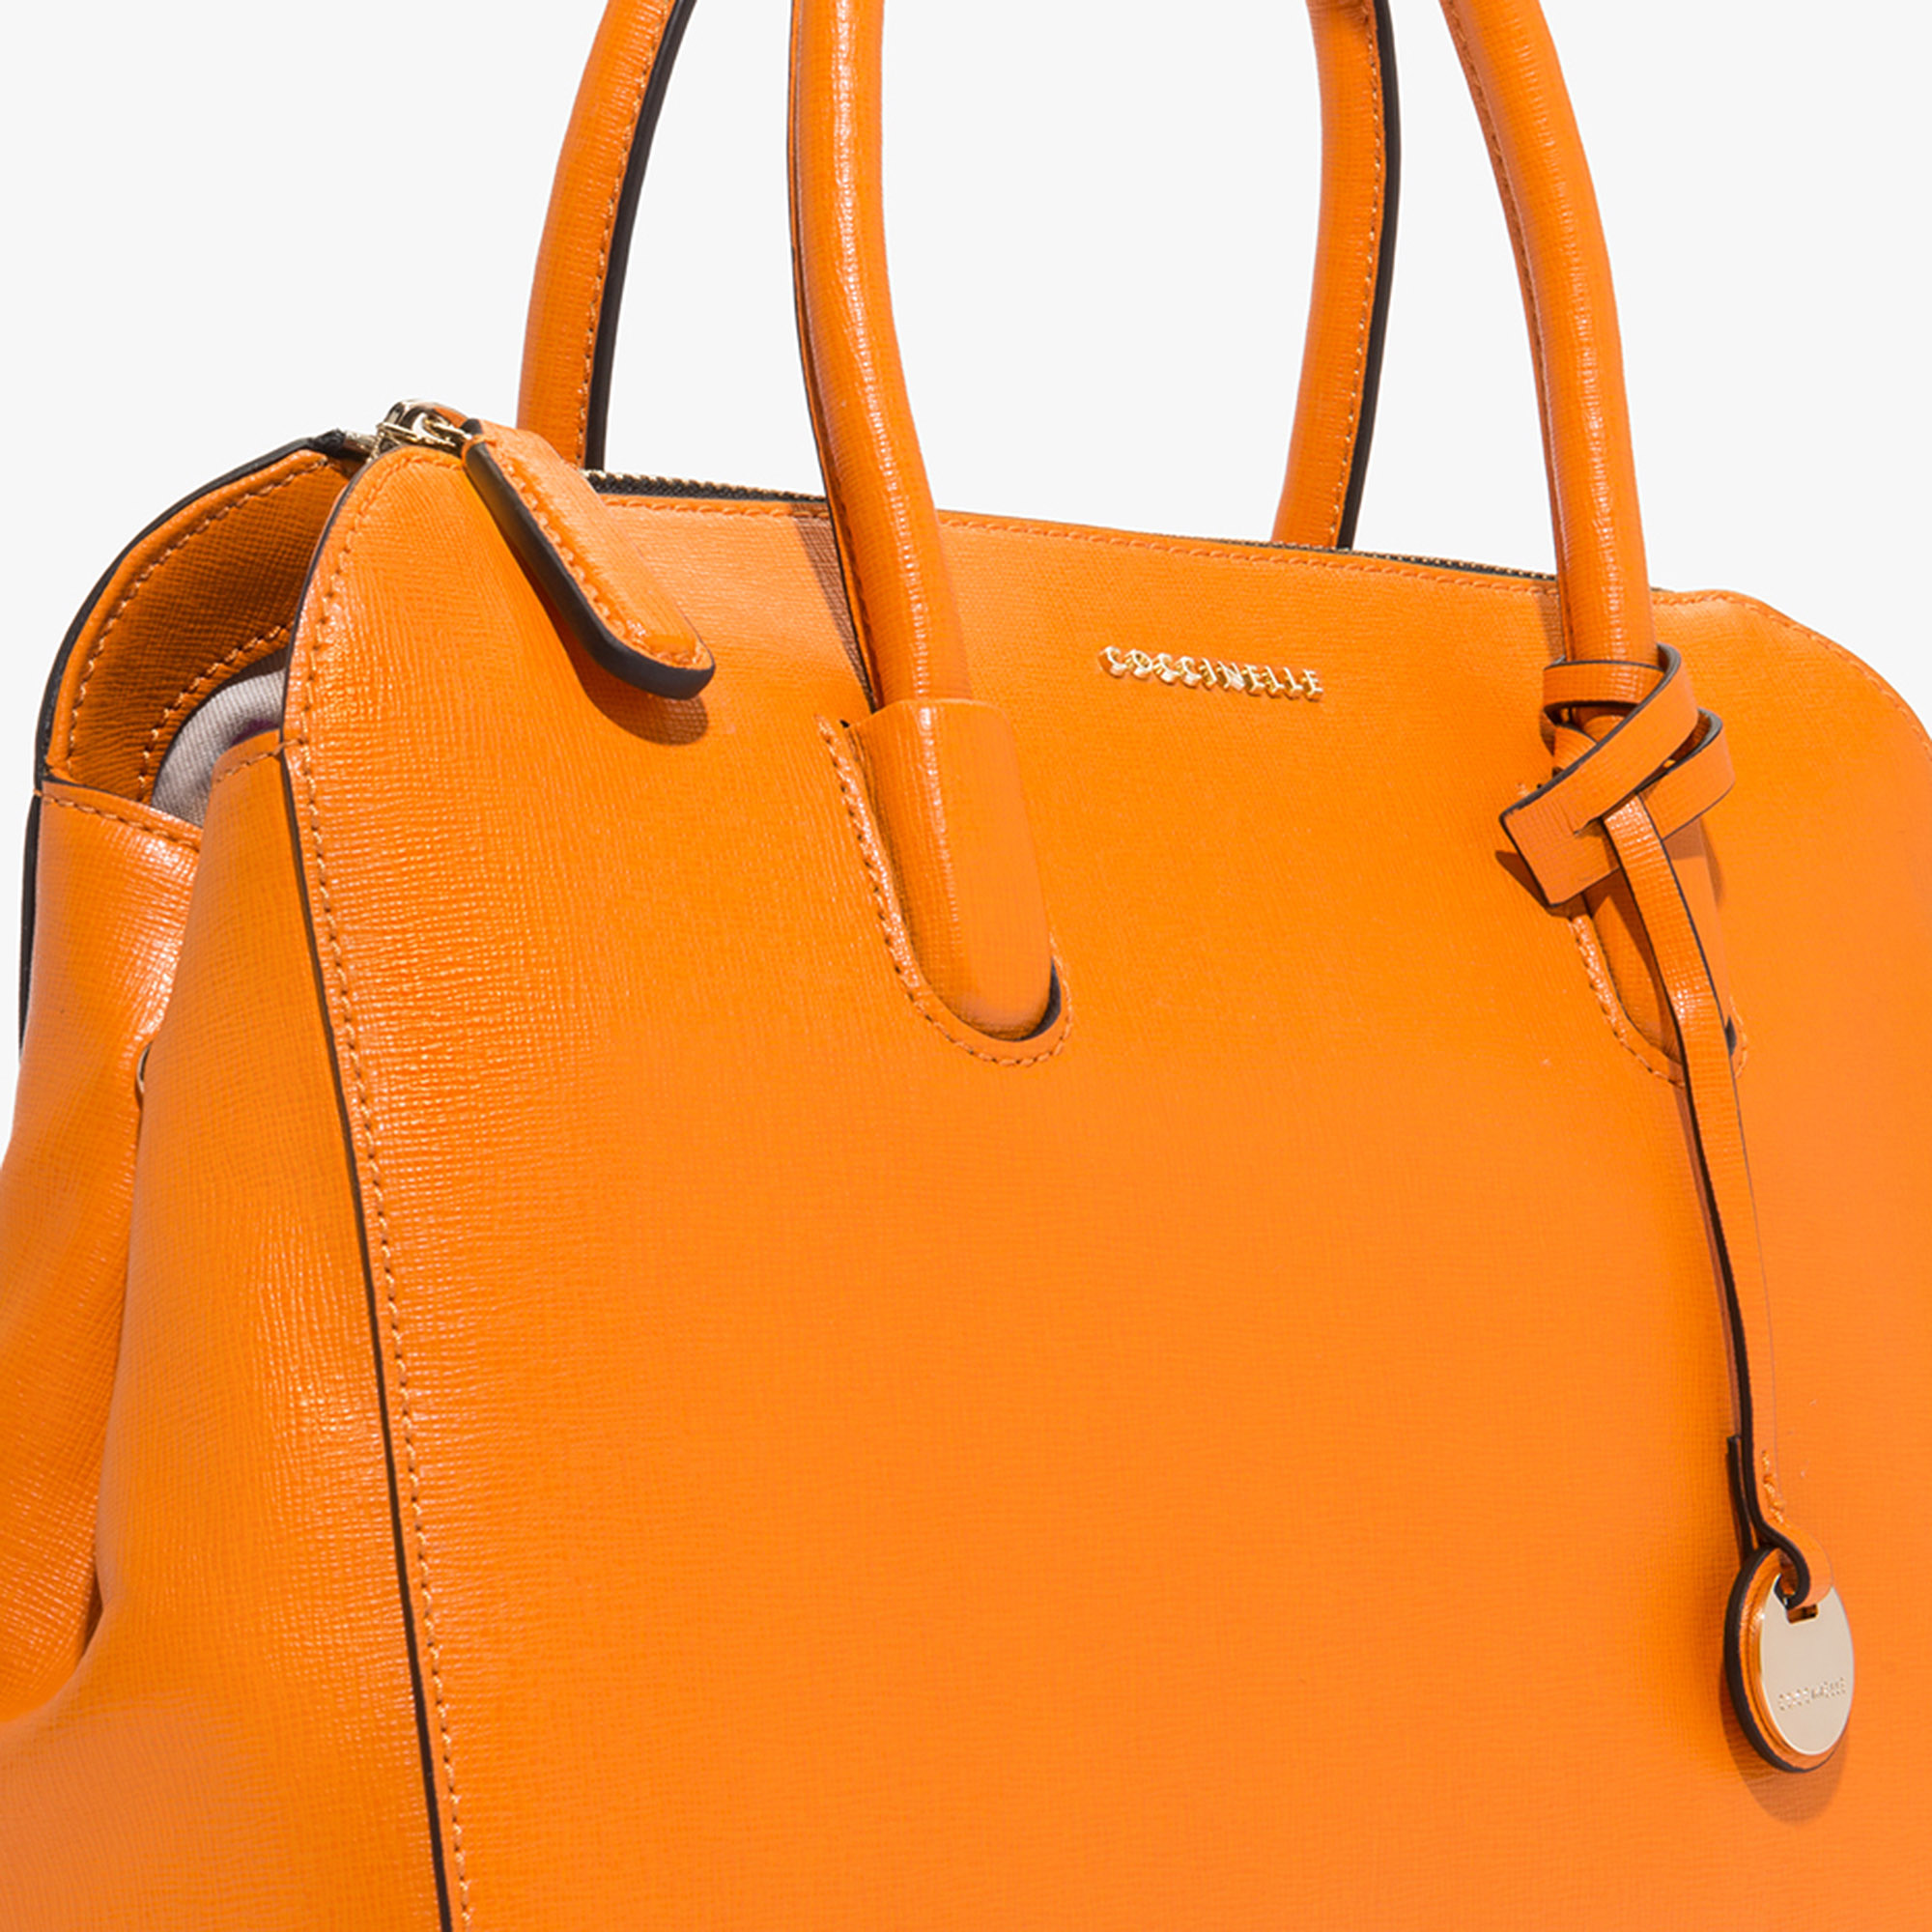 Coccinelle Clementine saffiano leather handbag